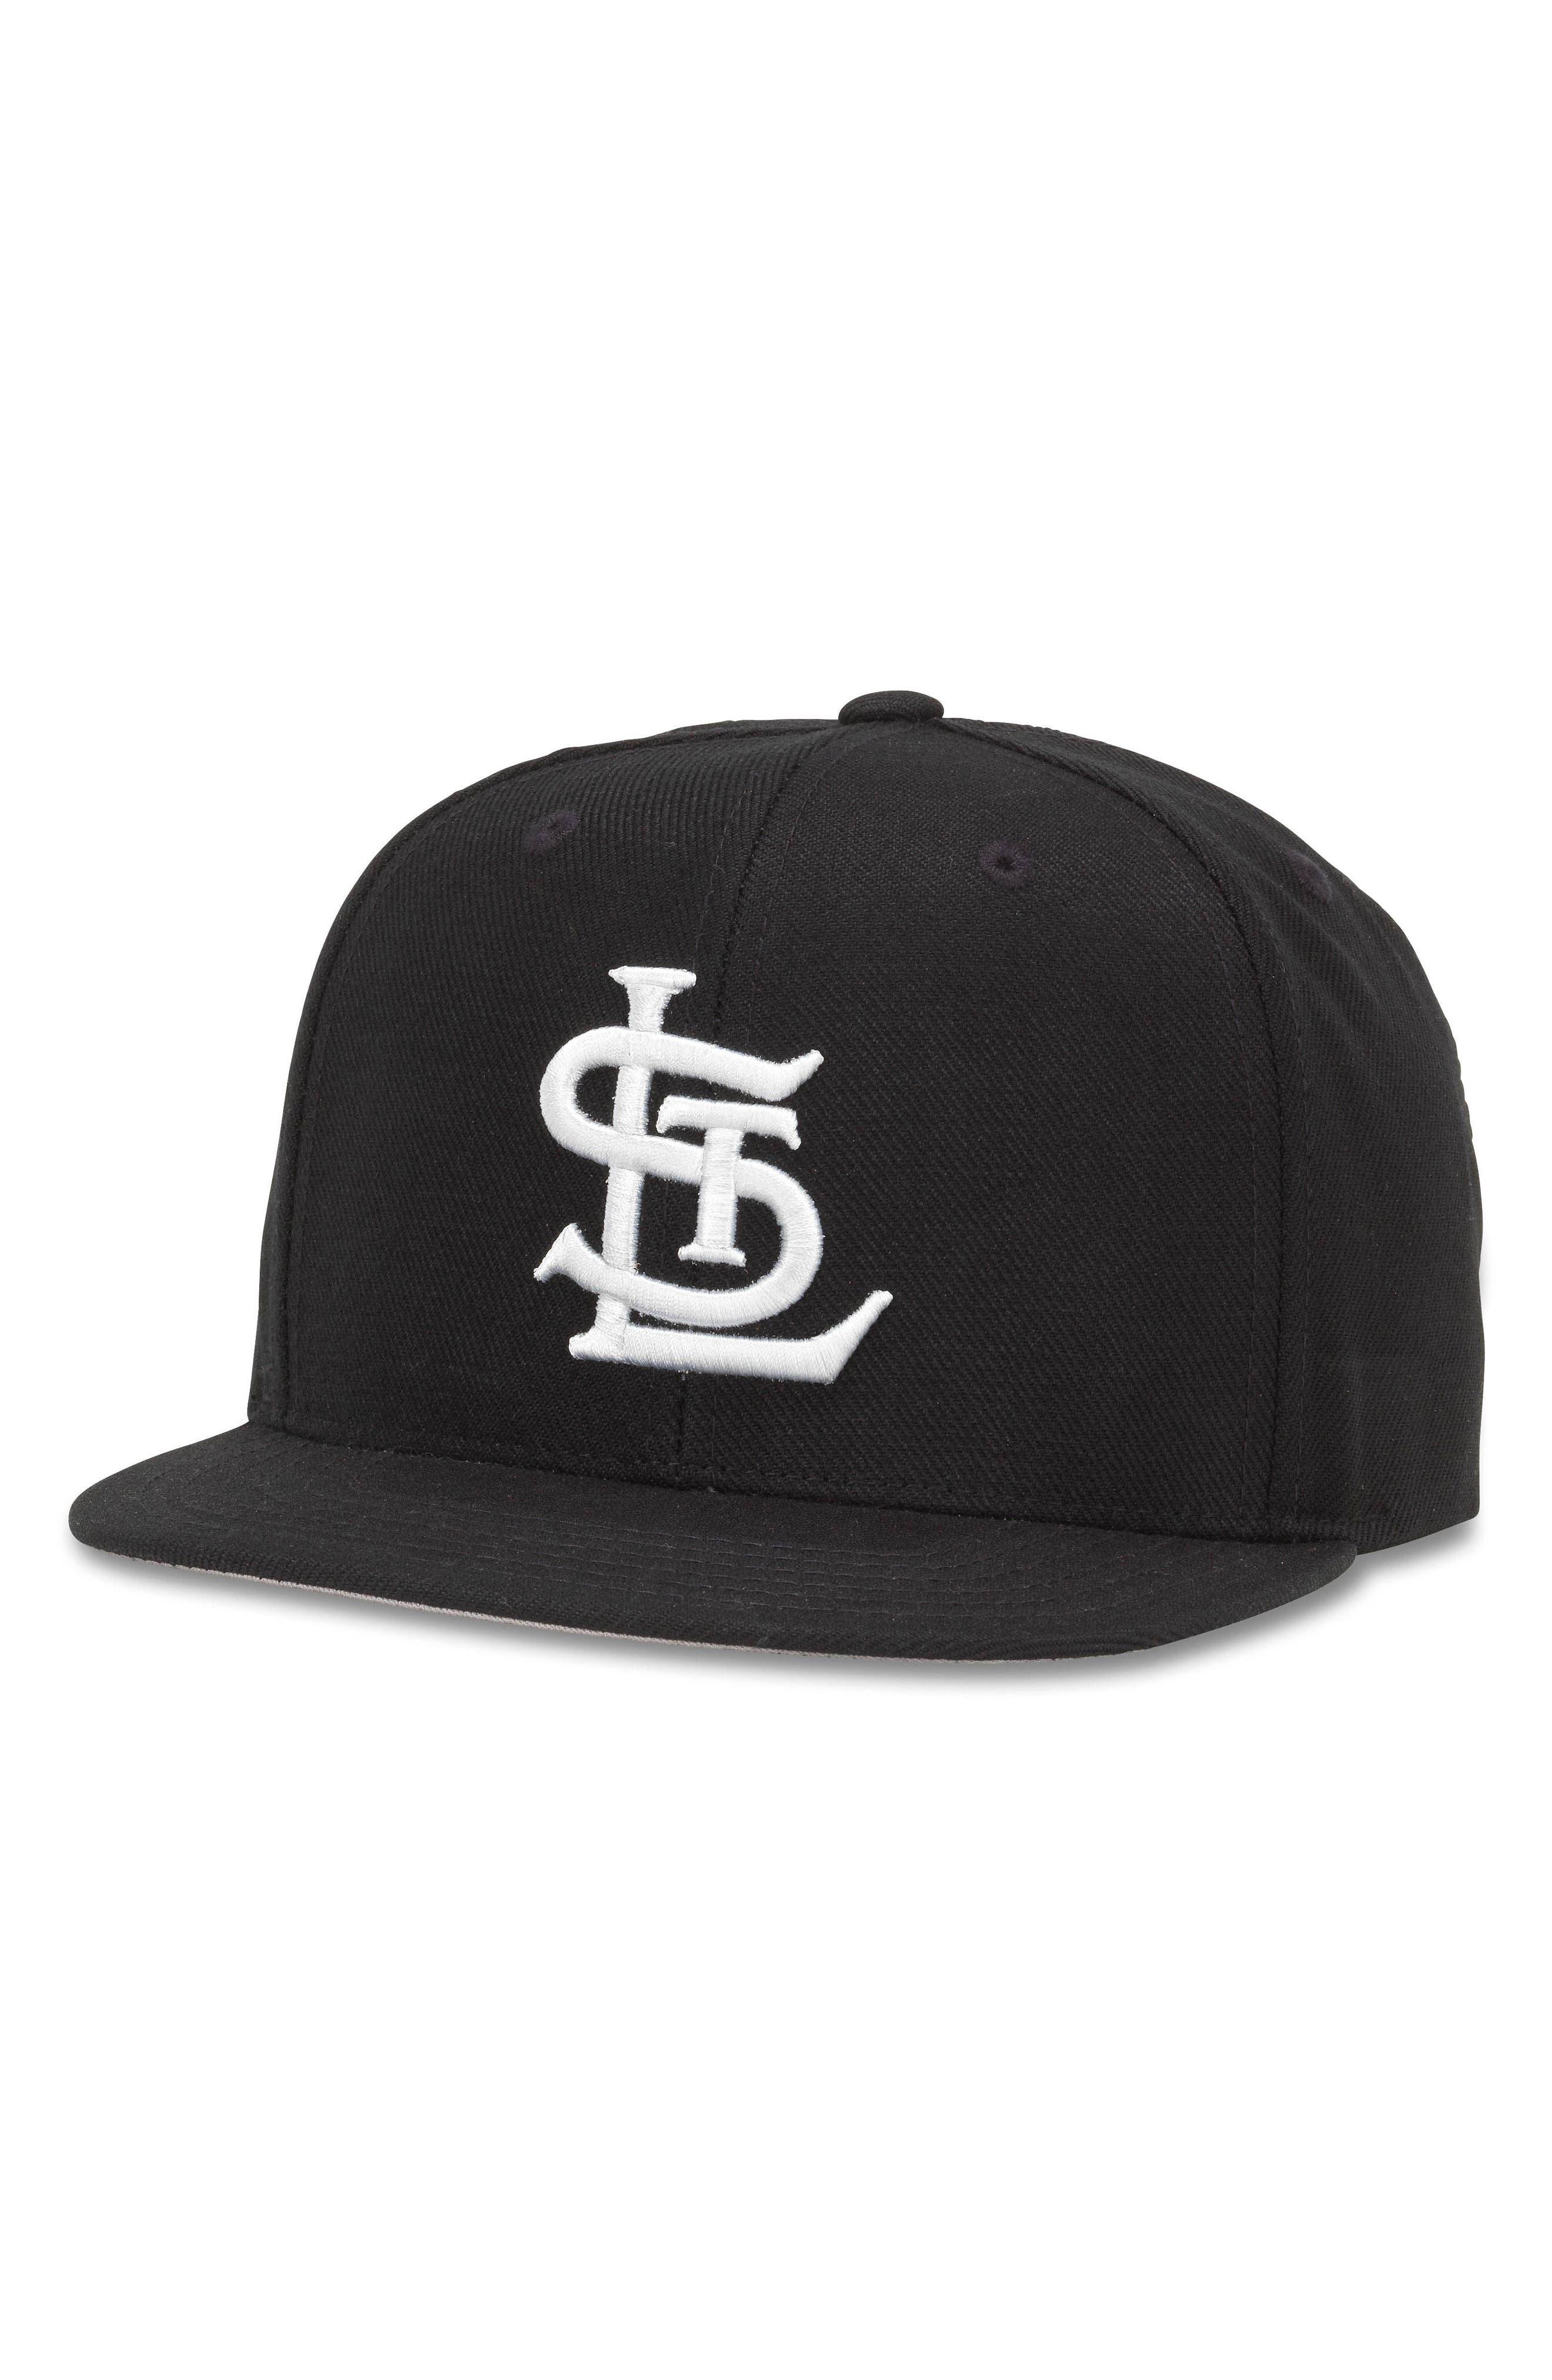 Alternate Image 1 Selected - American Needle Sideline MLB Baseball Cap